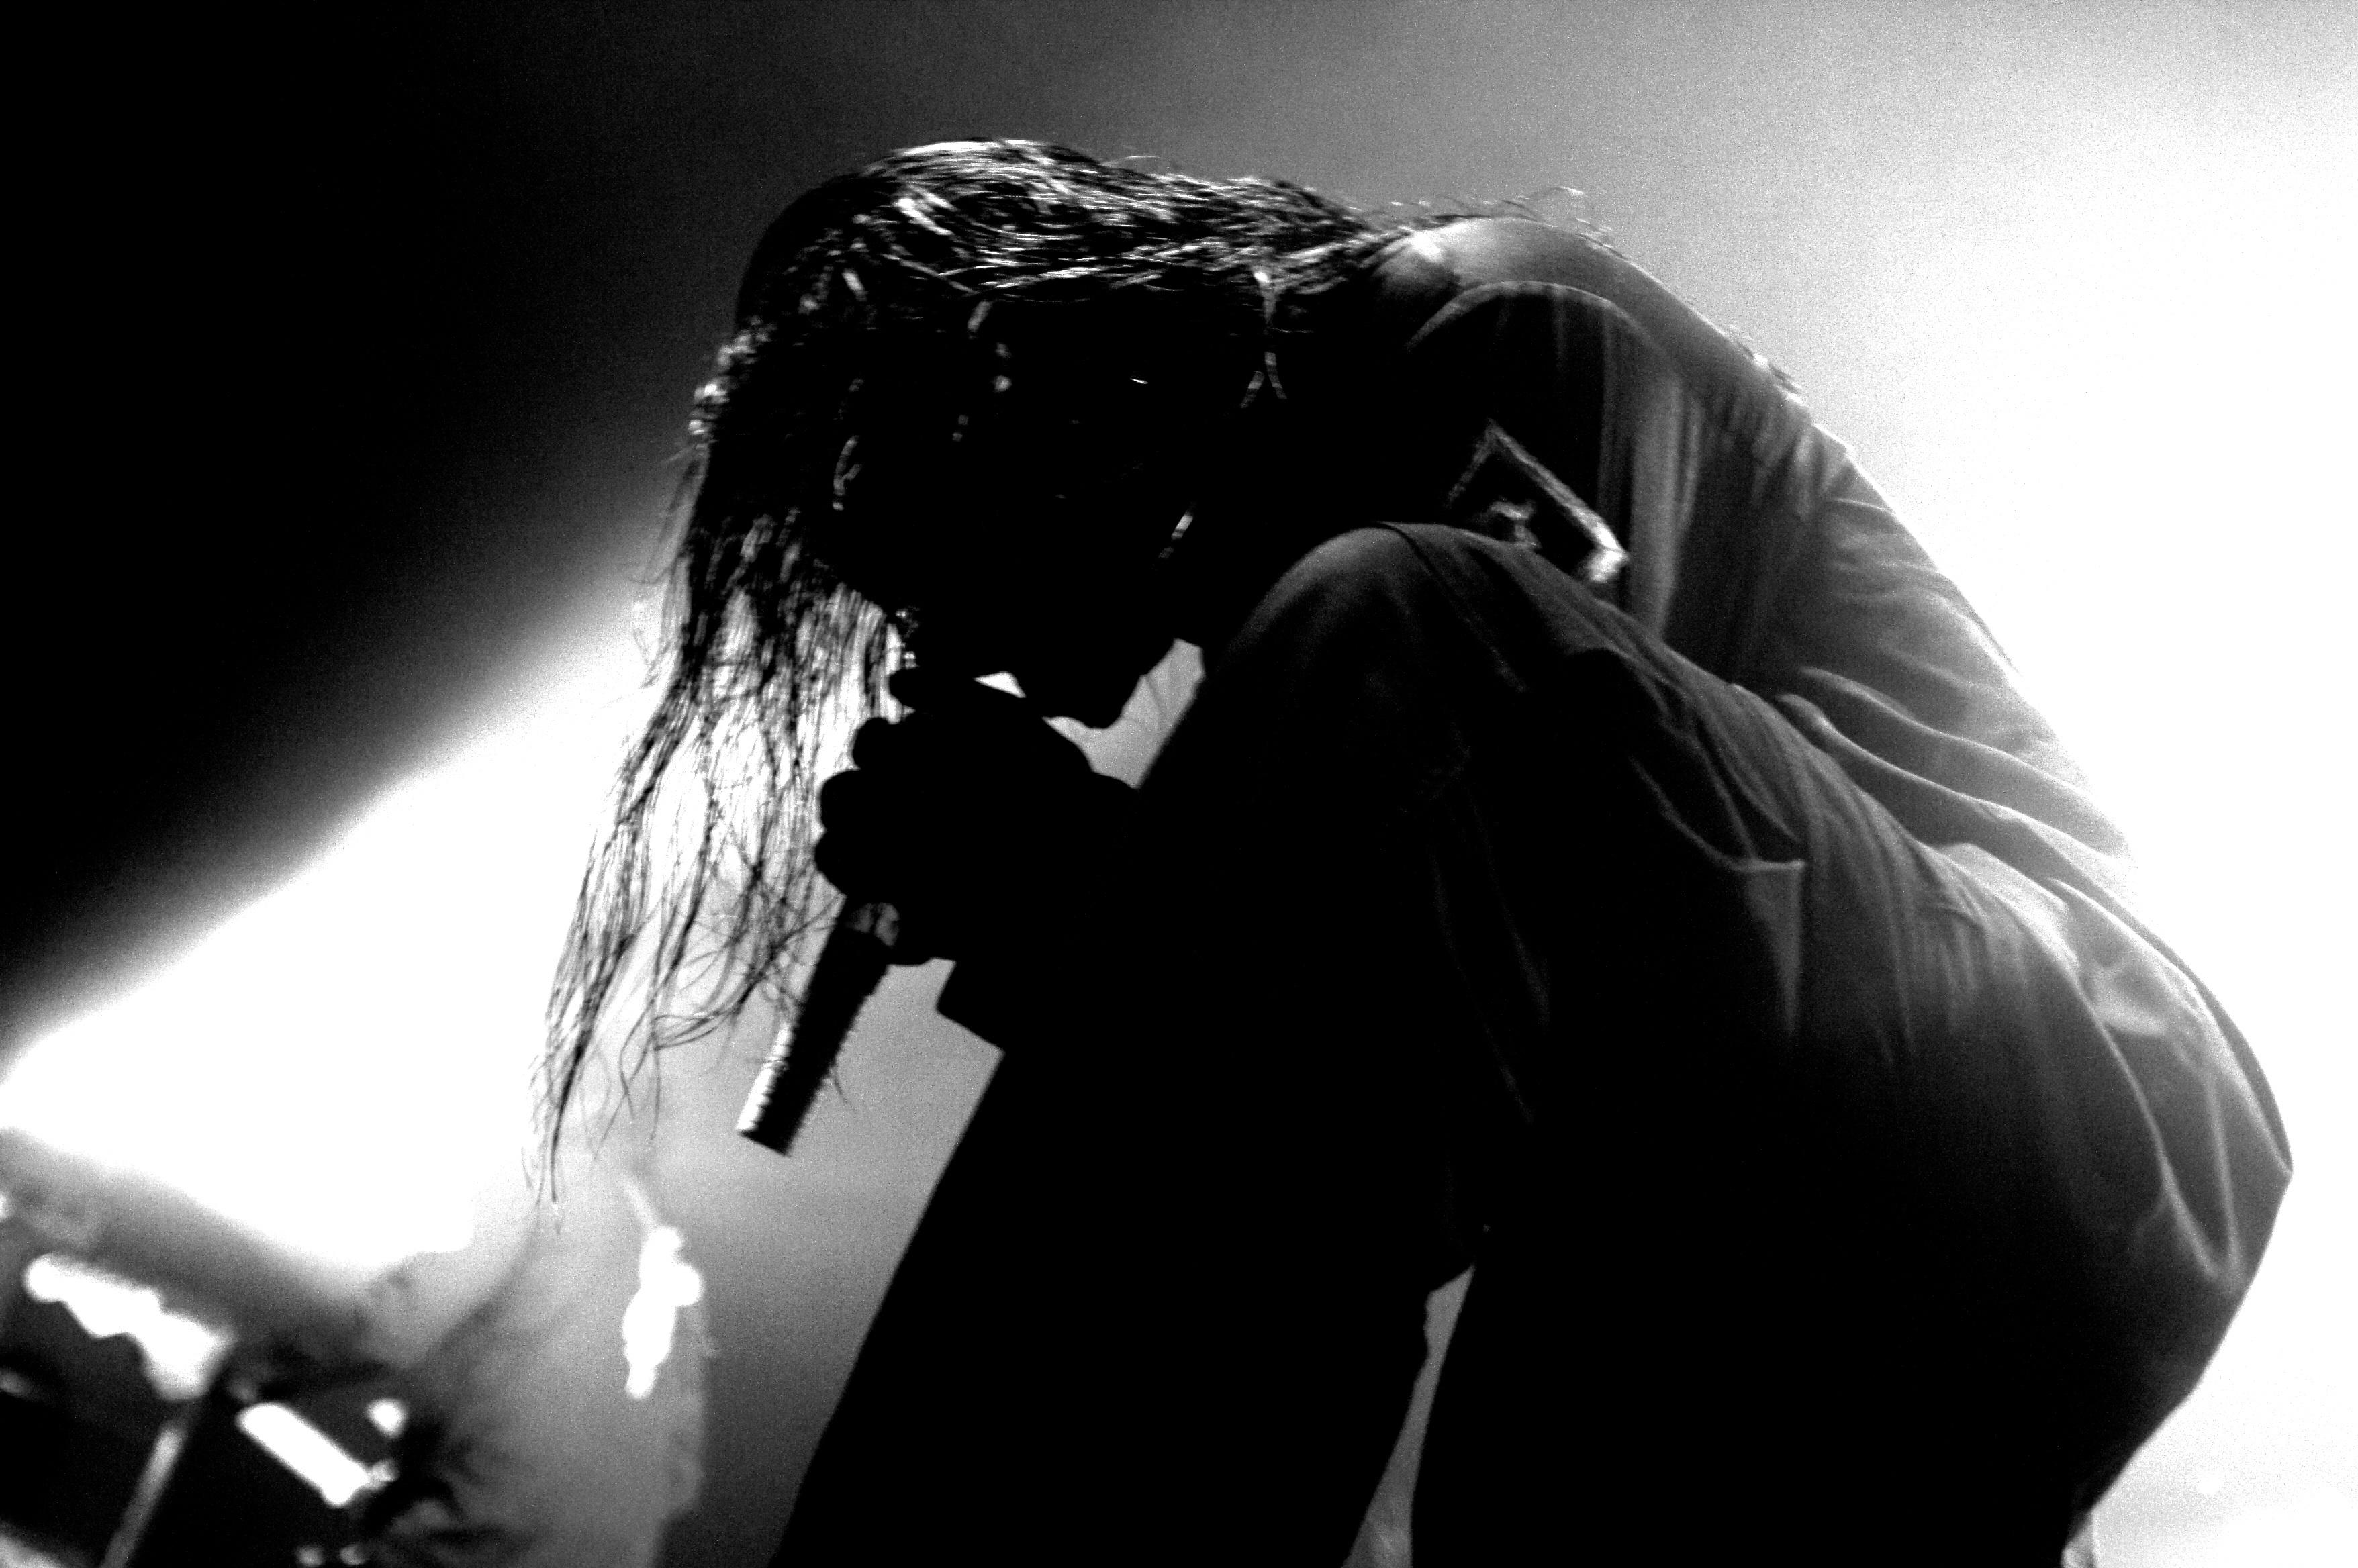 Fileslipknot Live In Toronto 2005 18jpg Wikimedia Commons